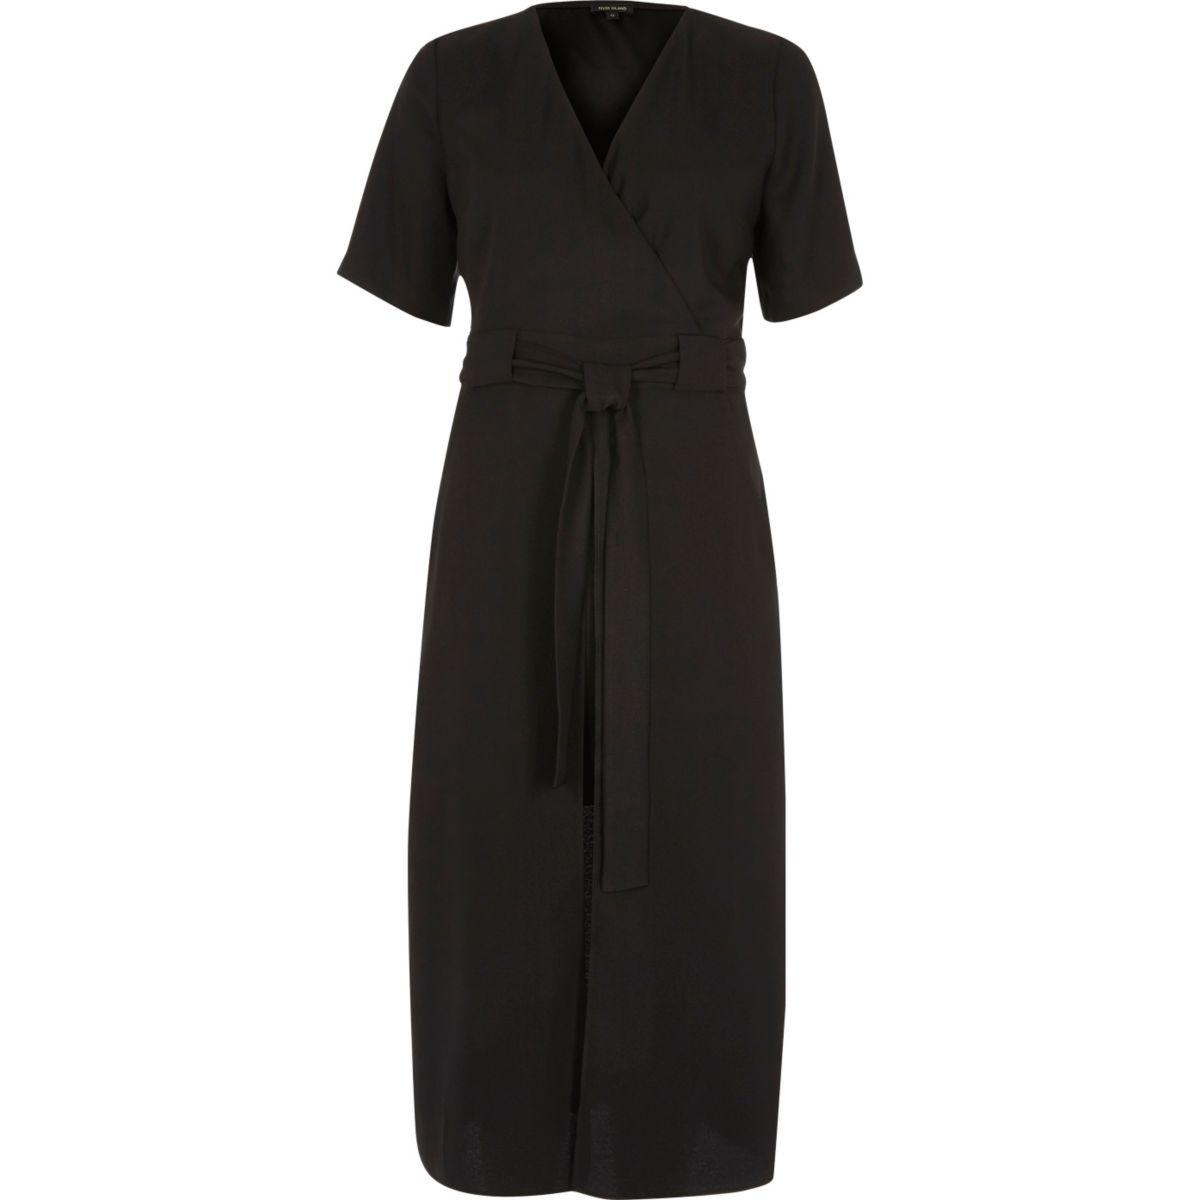 Black wrap short sleeve midi dress